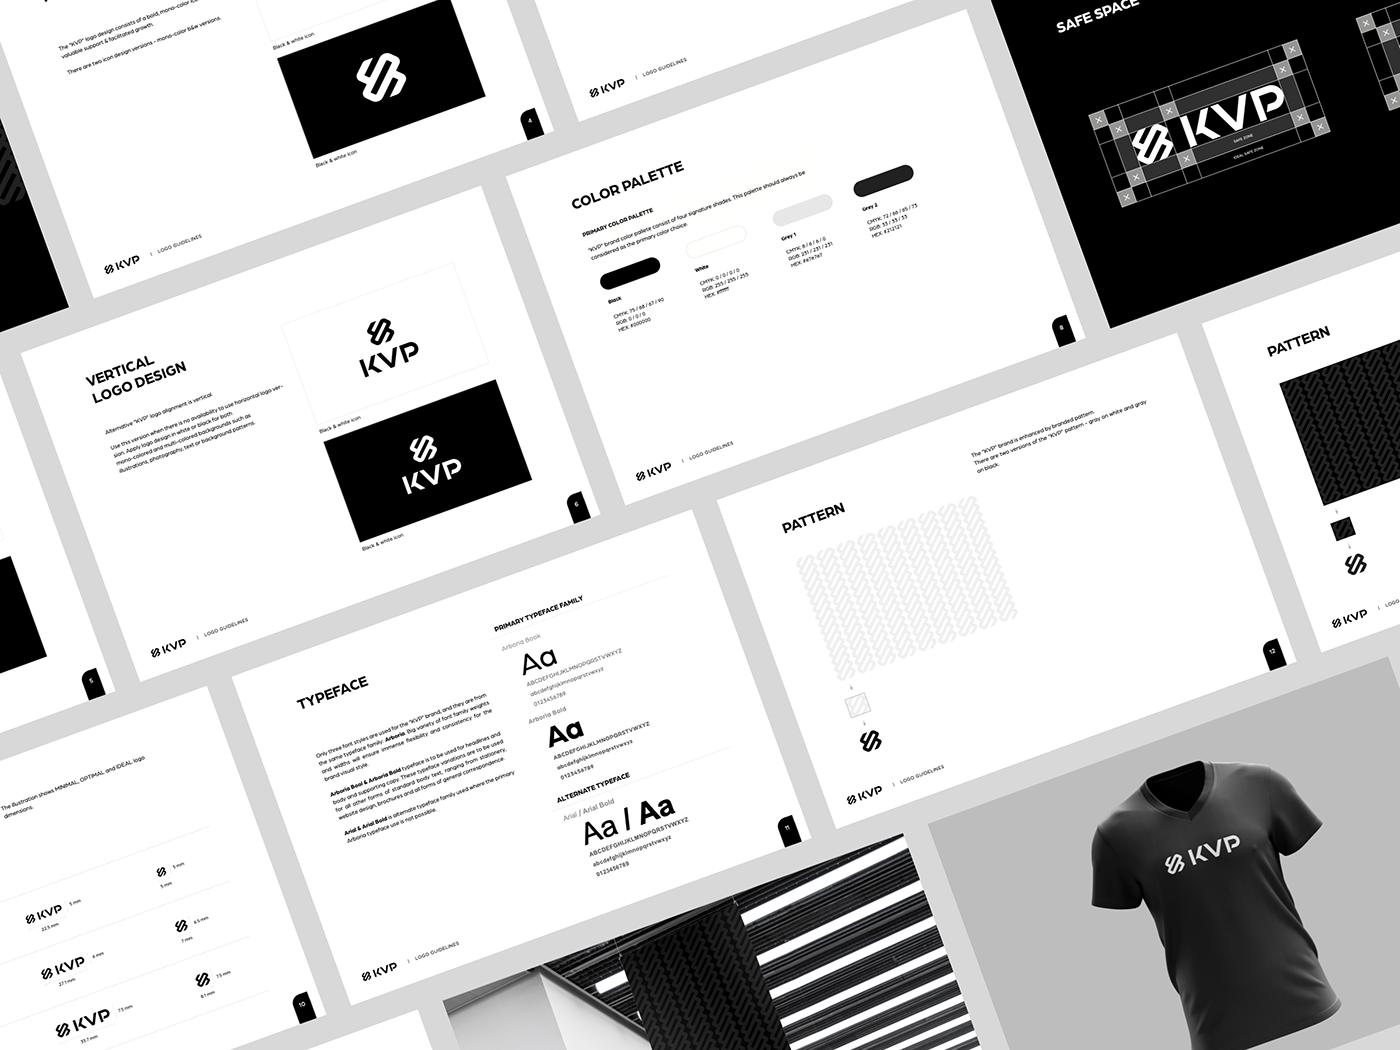 brand Brand Design Brand Guideline brand identity Branding design logo Startup venture capital type face